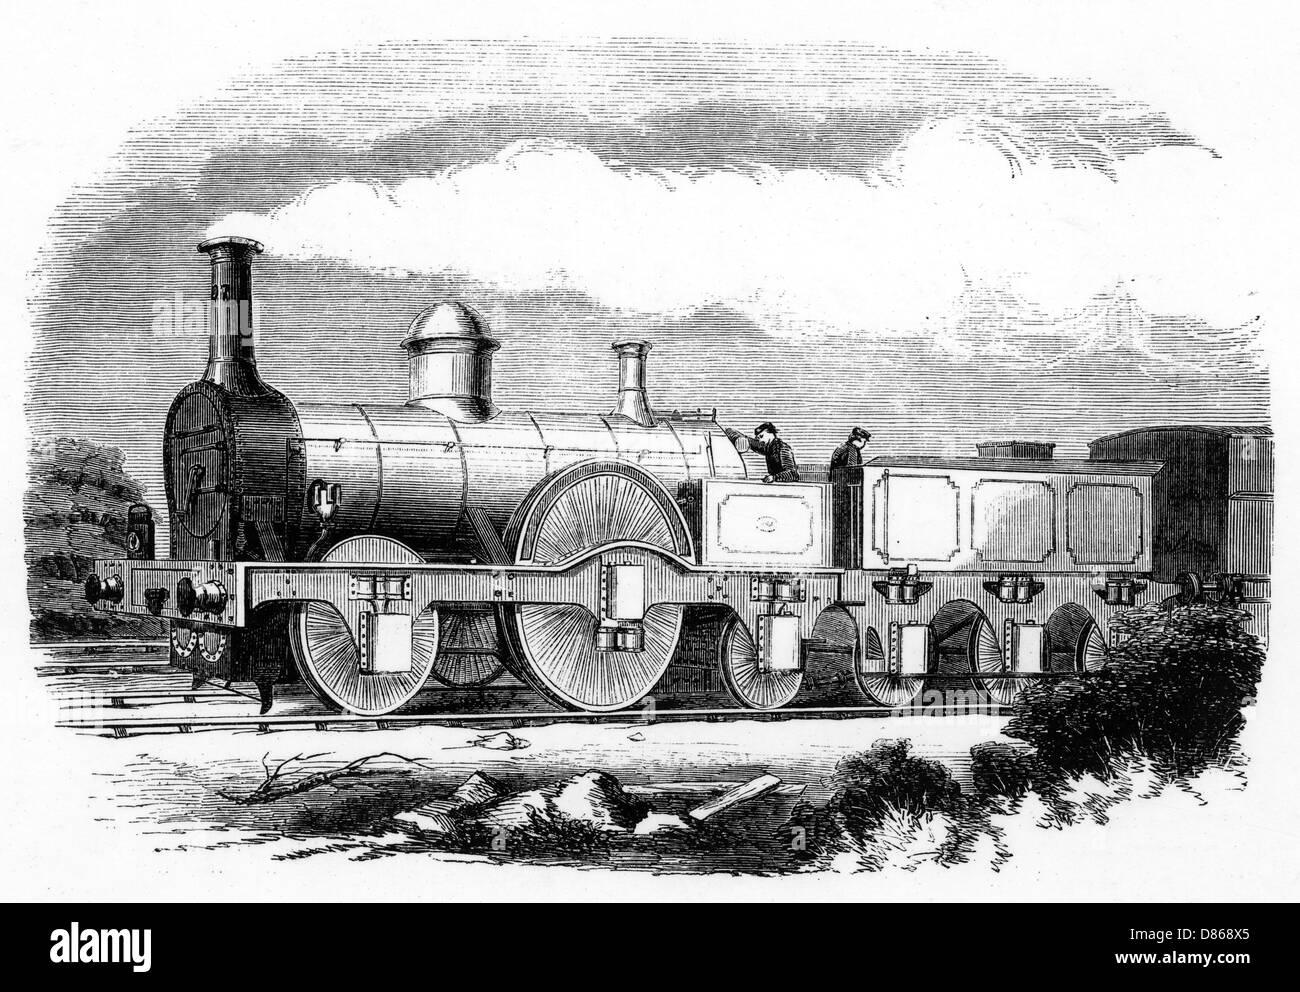 Mconnells Express Locomotive  1852. - Stock Image